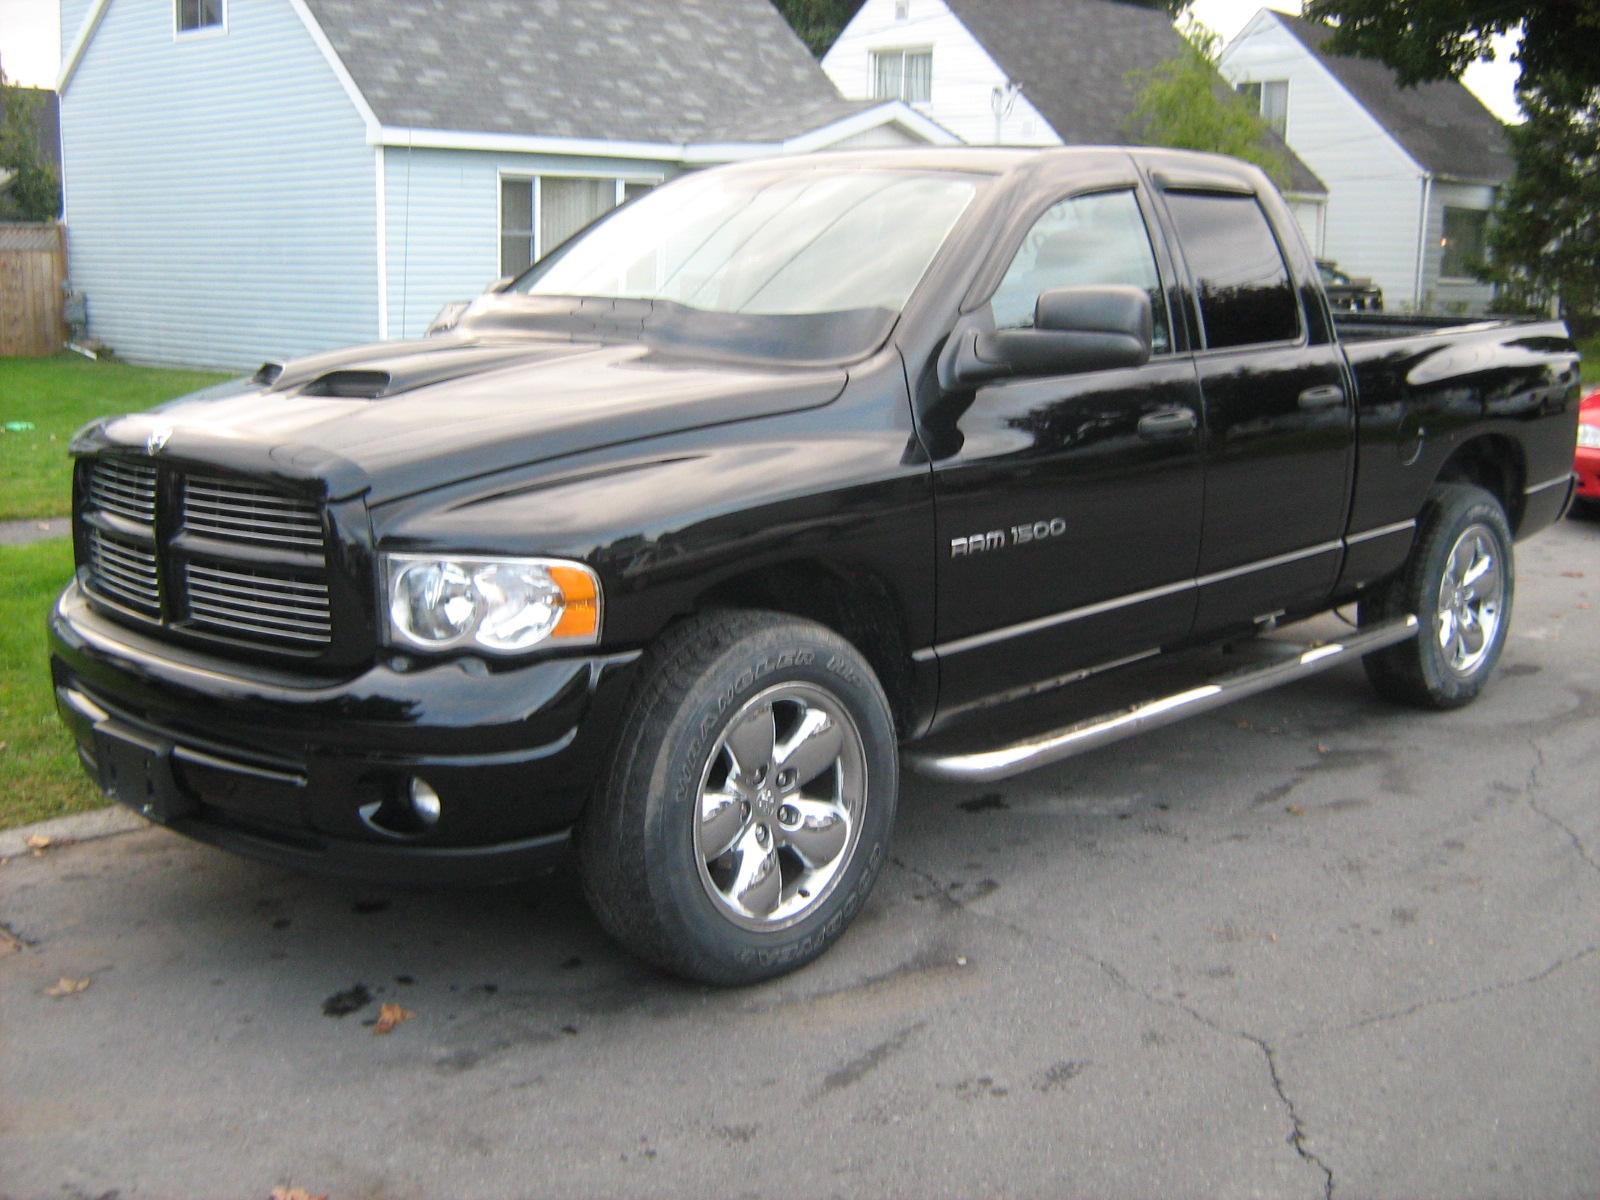 2004 dodge ram pickup 1500 pictures cargurus. Black Bedroom Furniture Sets. Home Design Ideas